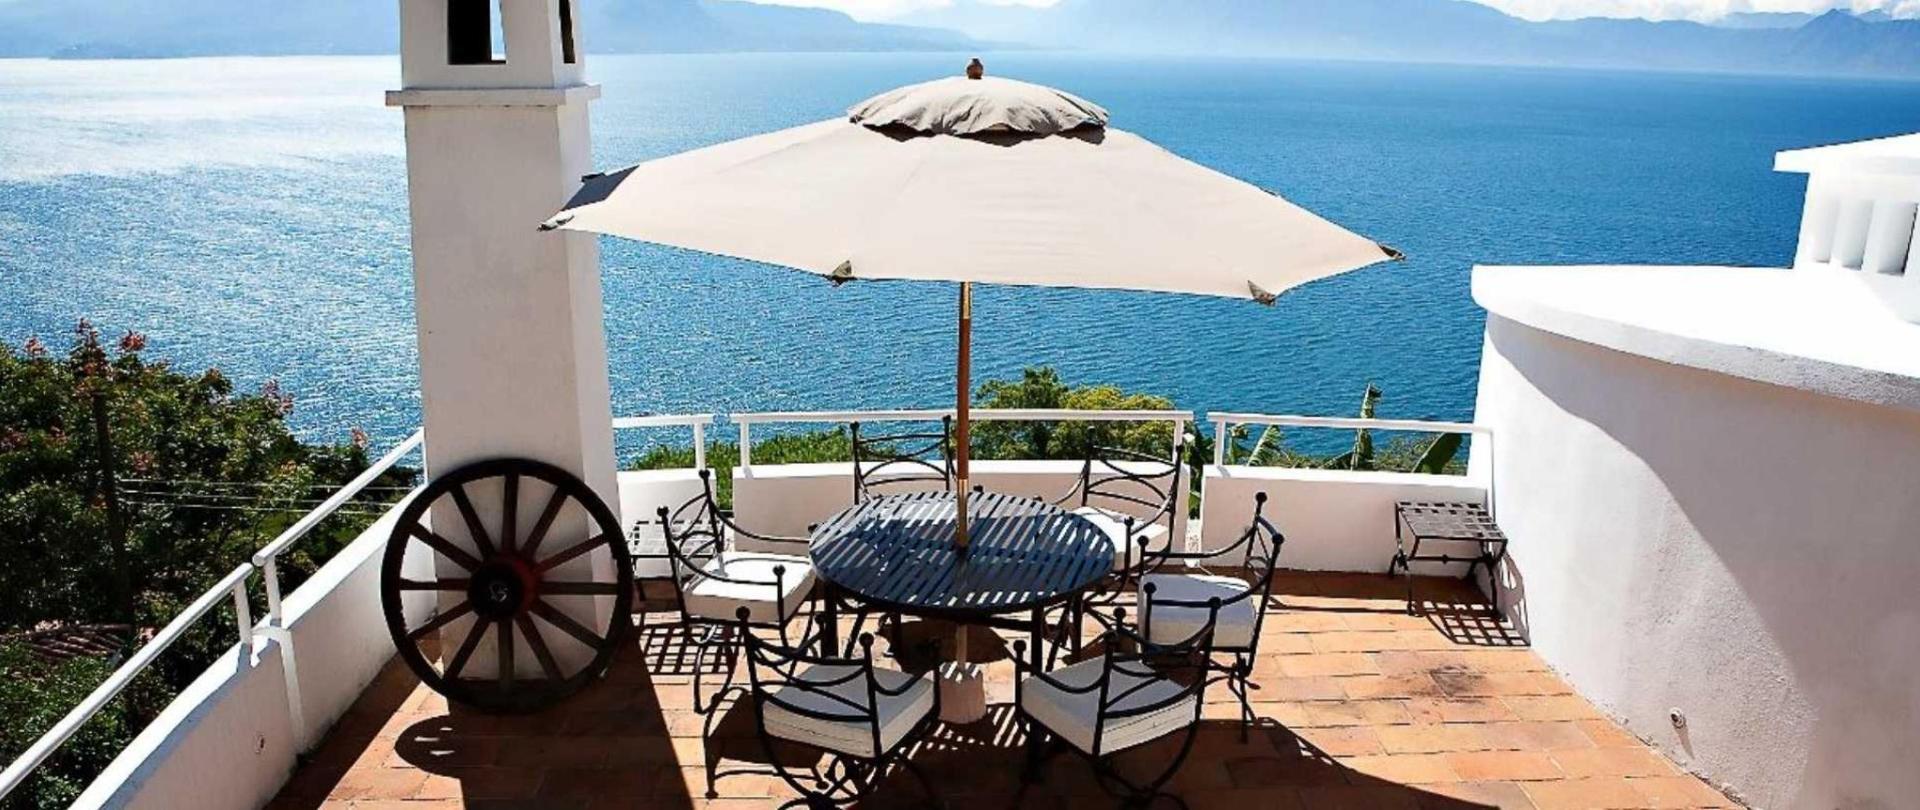 dining-room-terrace1-1.jpg.1920x807_default.jpg